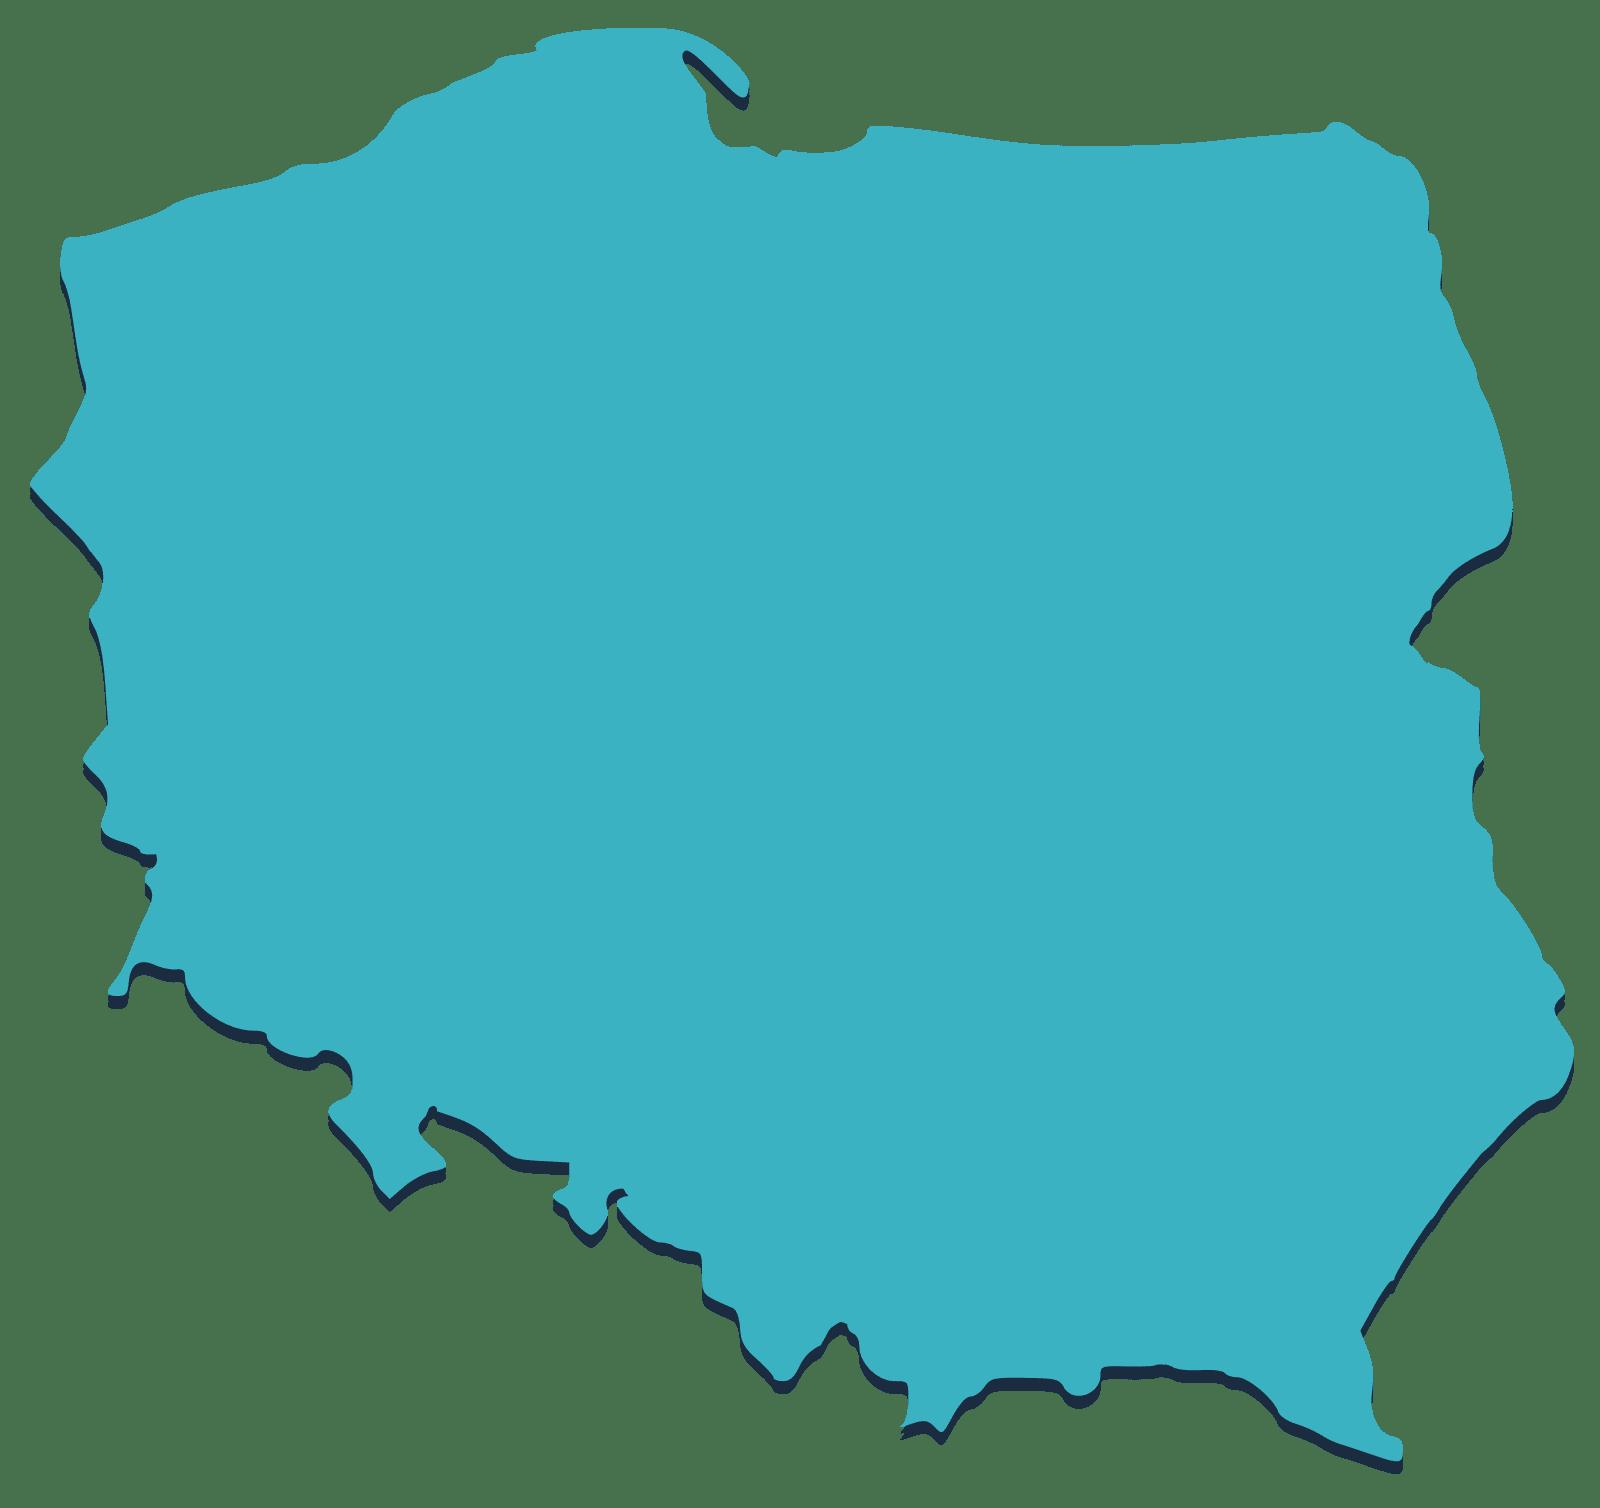 mapa polski, dotacje ogólnokrajowe